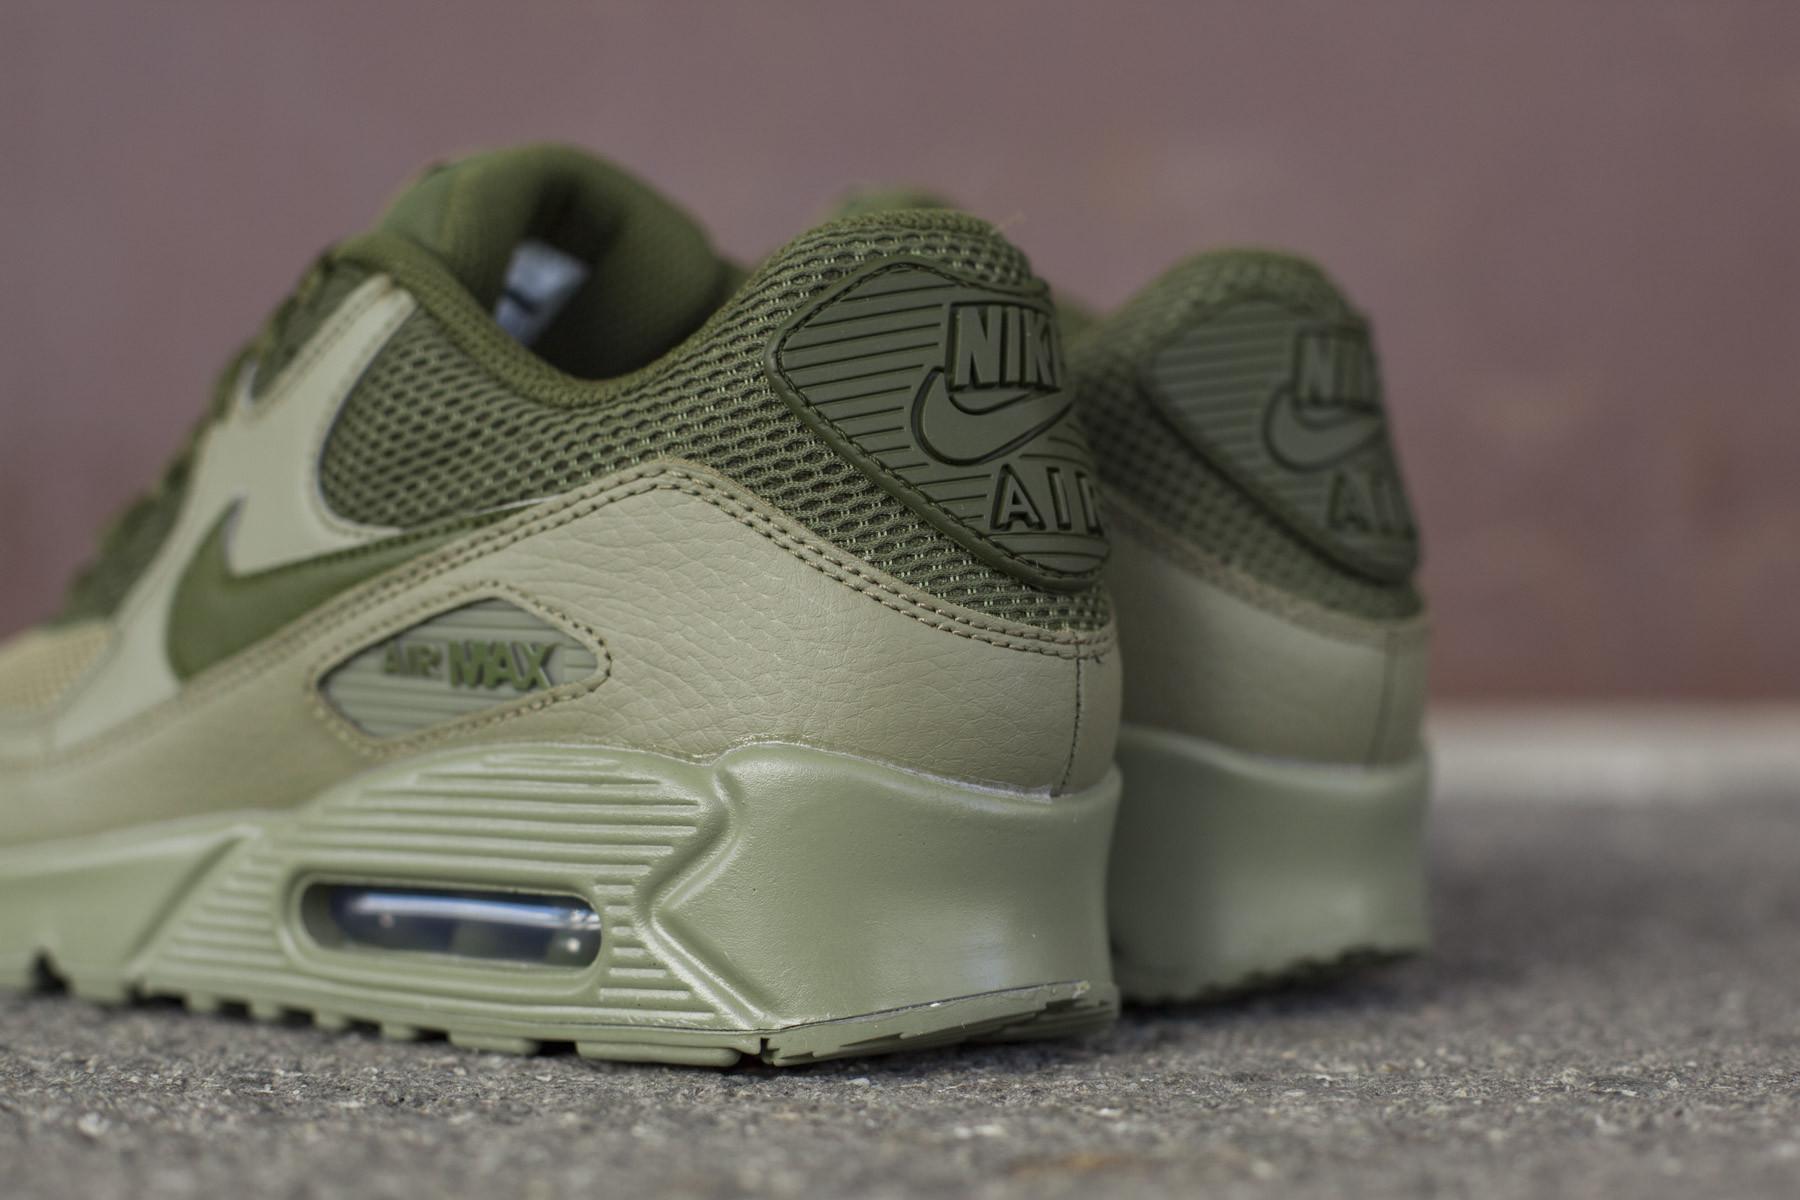 Nike Air Max 90 Essential - Sneakers - Sneaker.no 2d0e21a0f